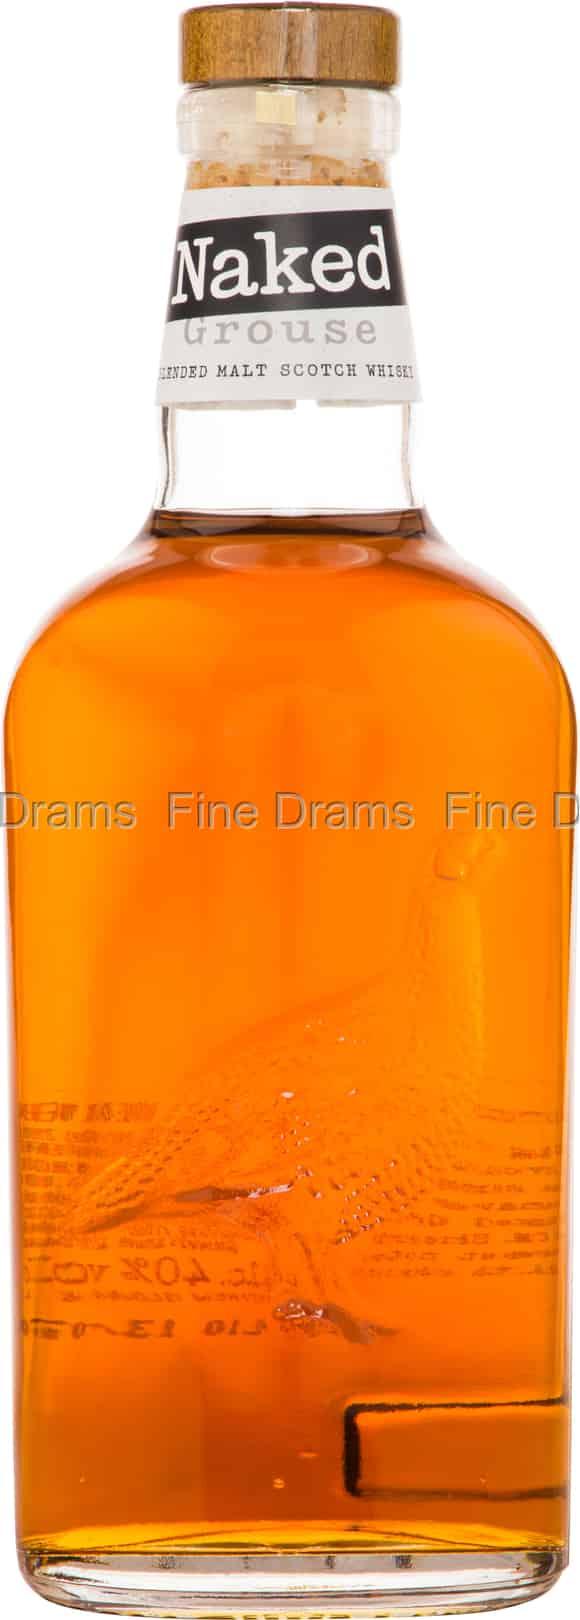 The Naked Grouse - Blended Whisky på bedste vis